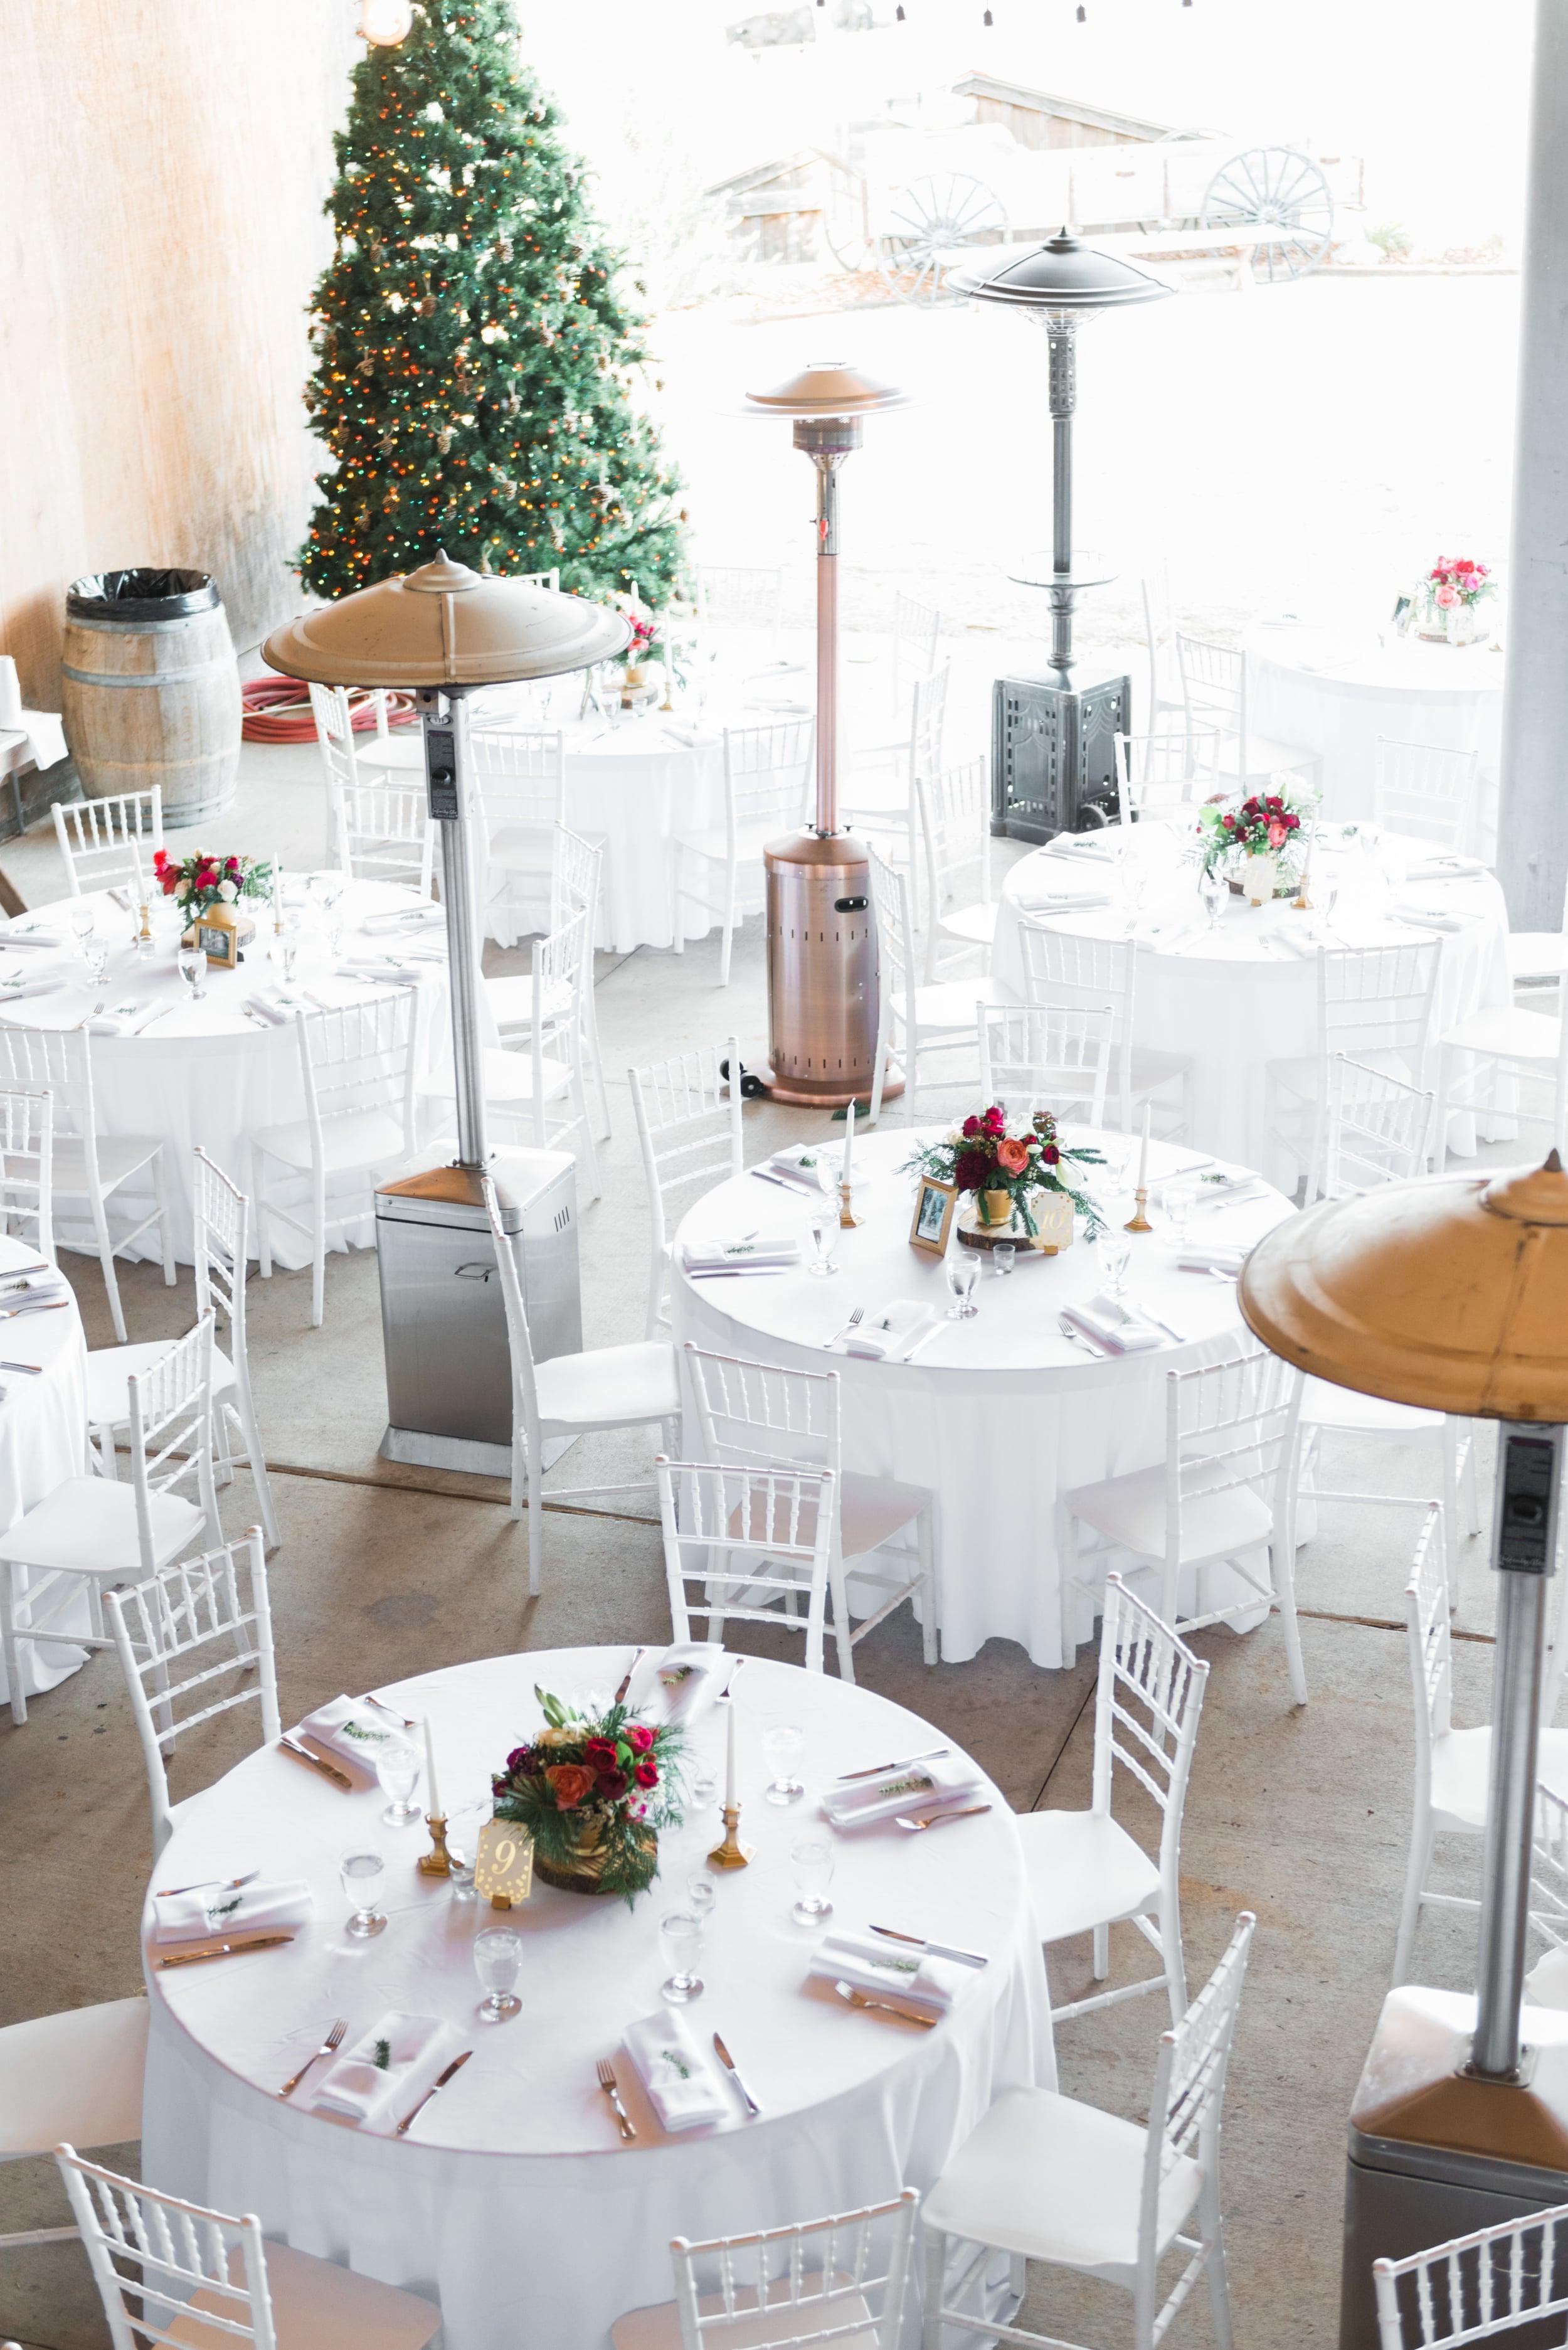 Natalie_Schutt_Photography_Winter_Wedding_San_Luis_Obispo-73.jpg